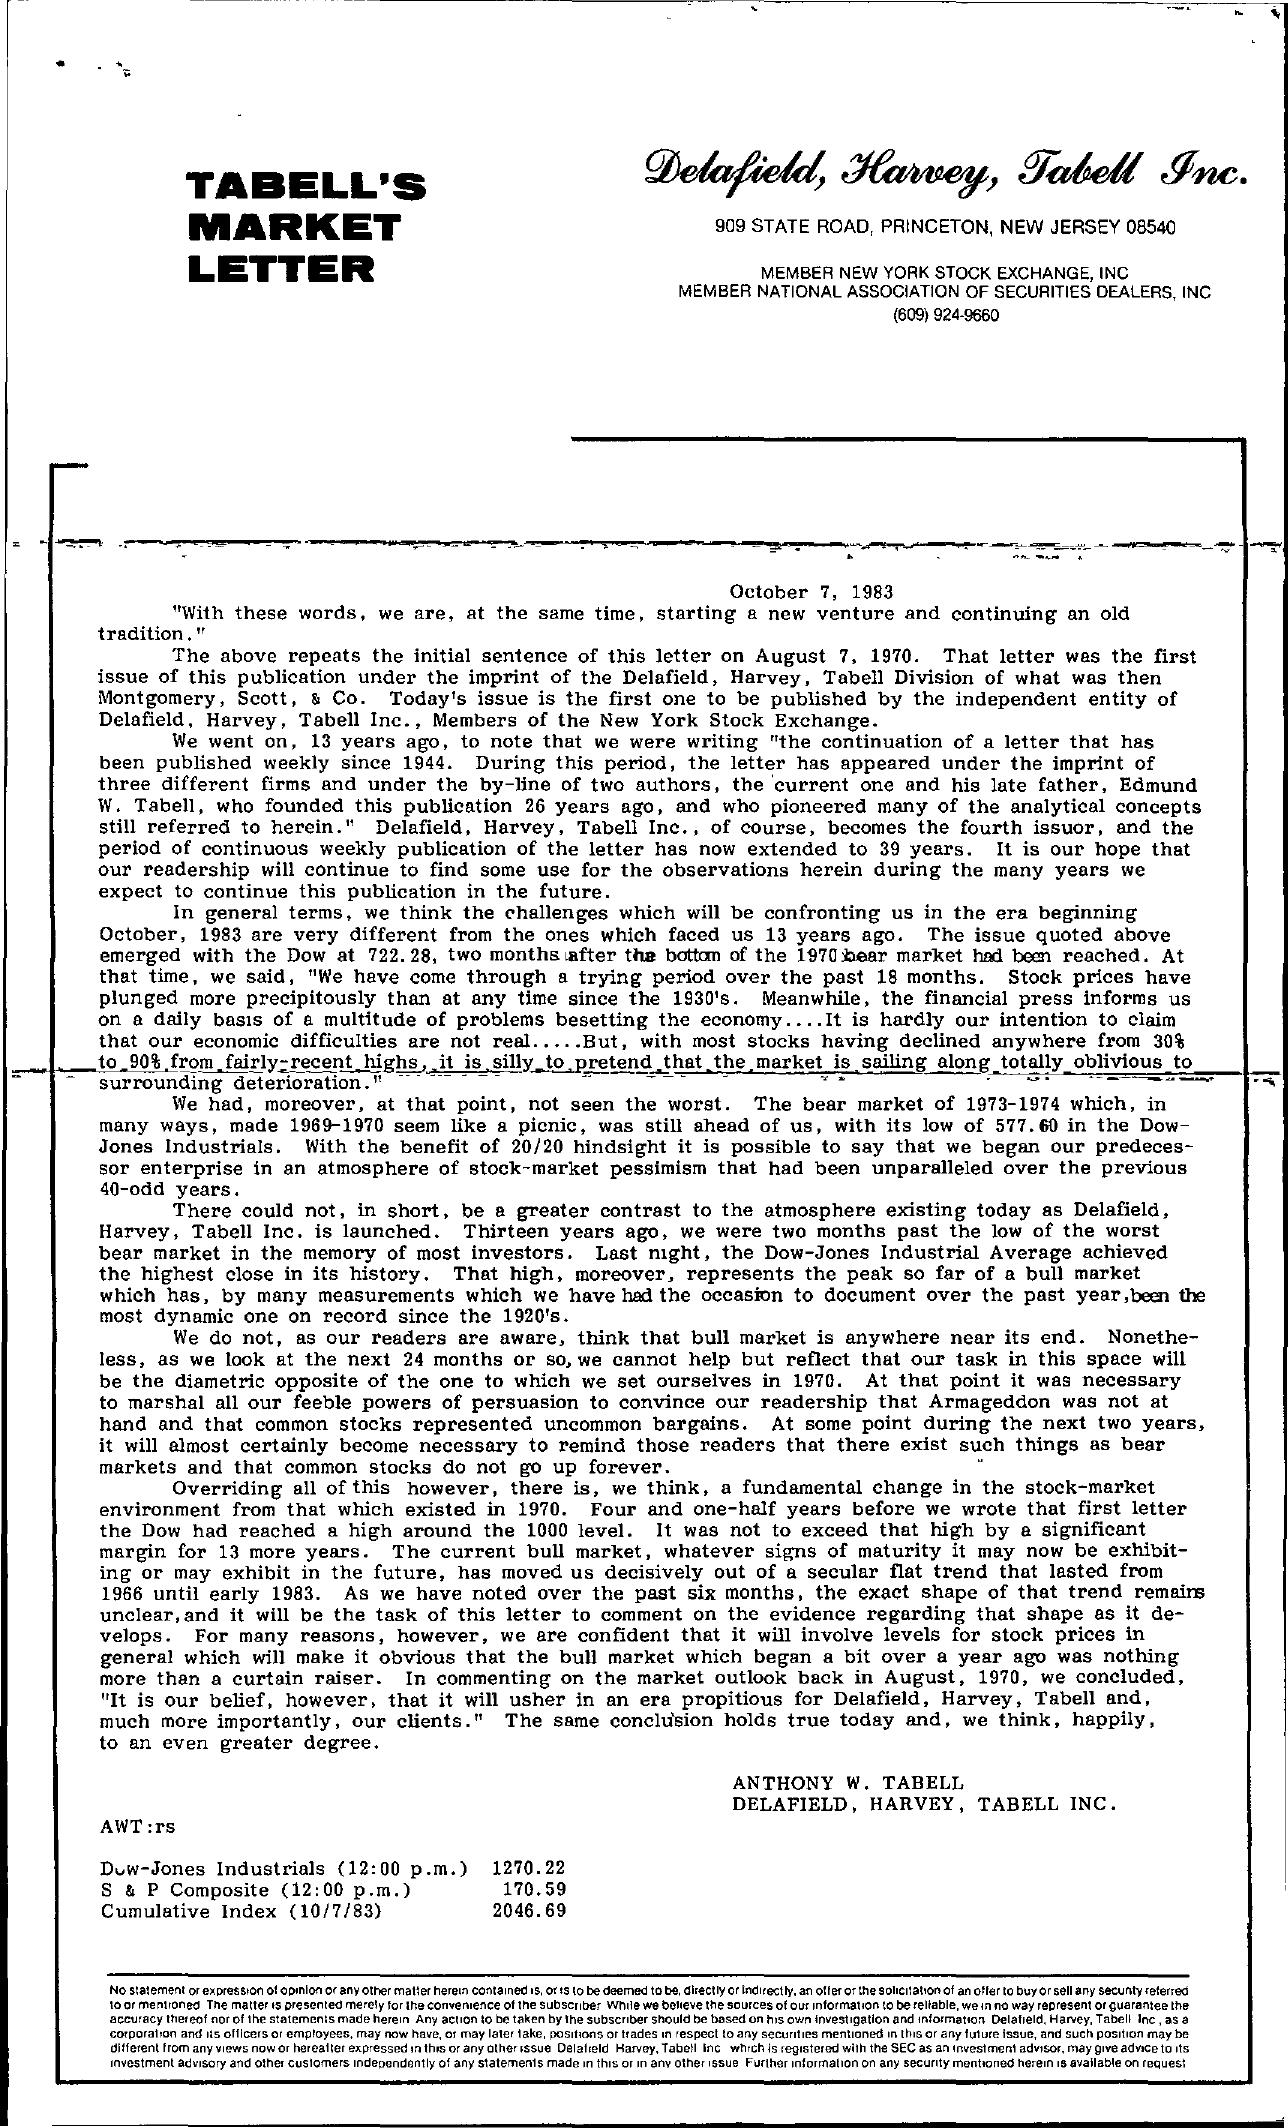 Tabell's Market Letter - October 07, 1983